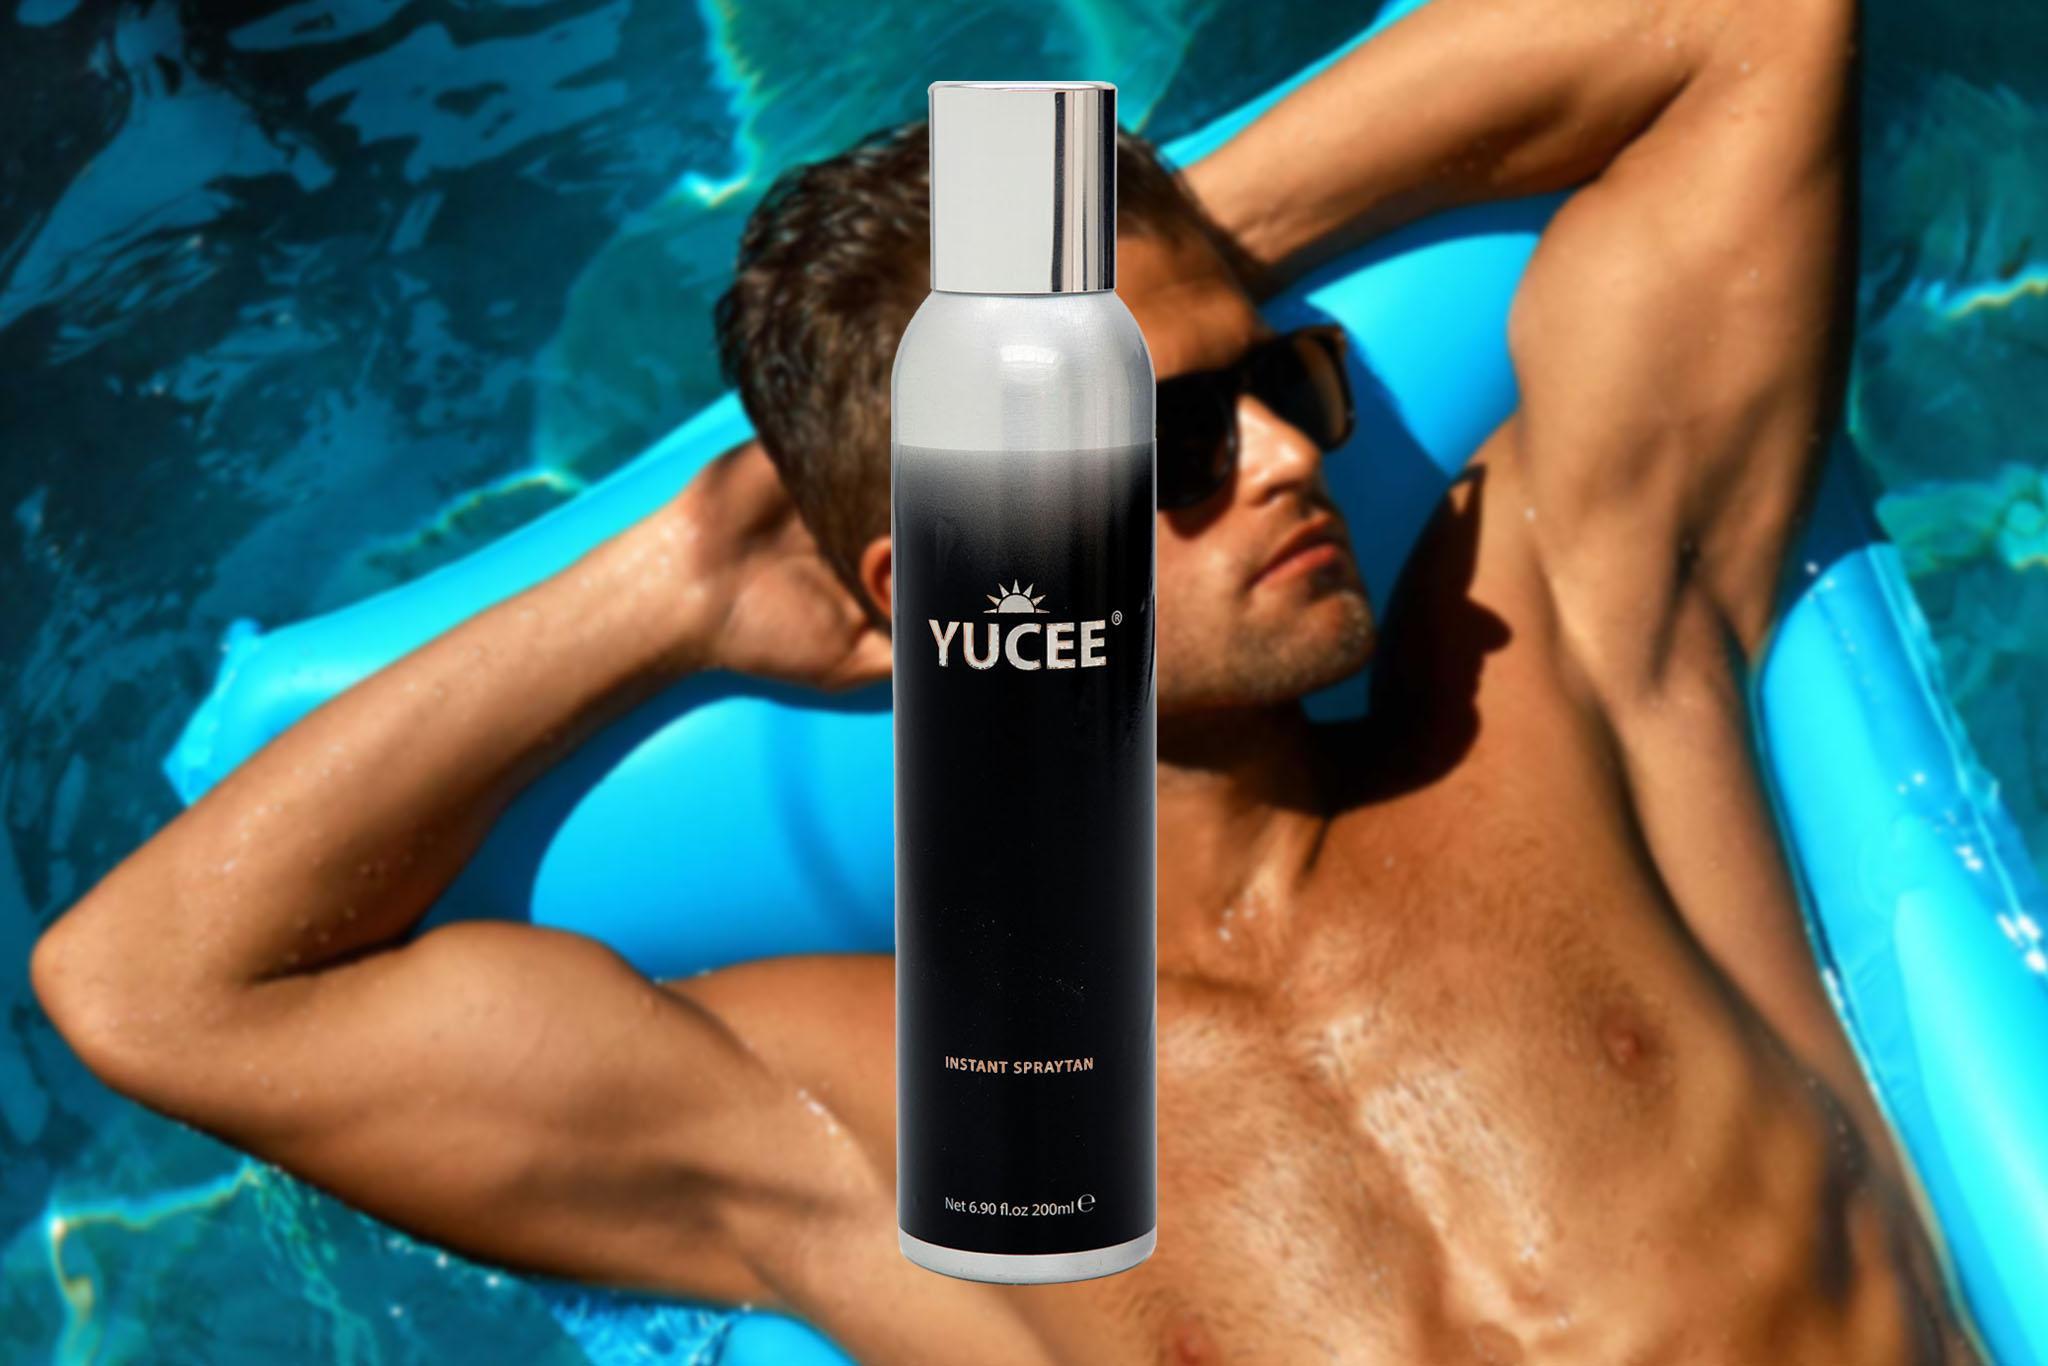 Yucee Tanning Spray met mannelijk model